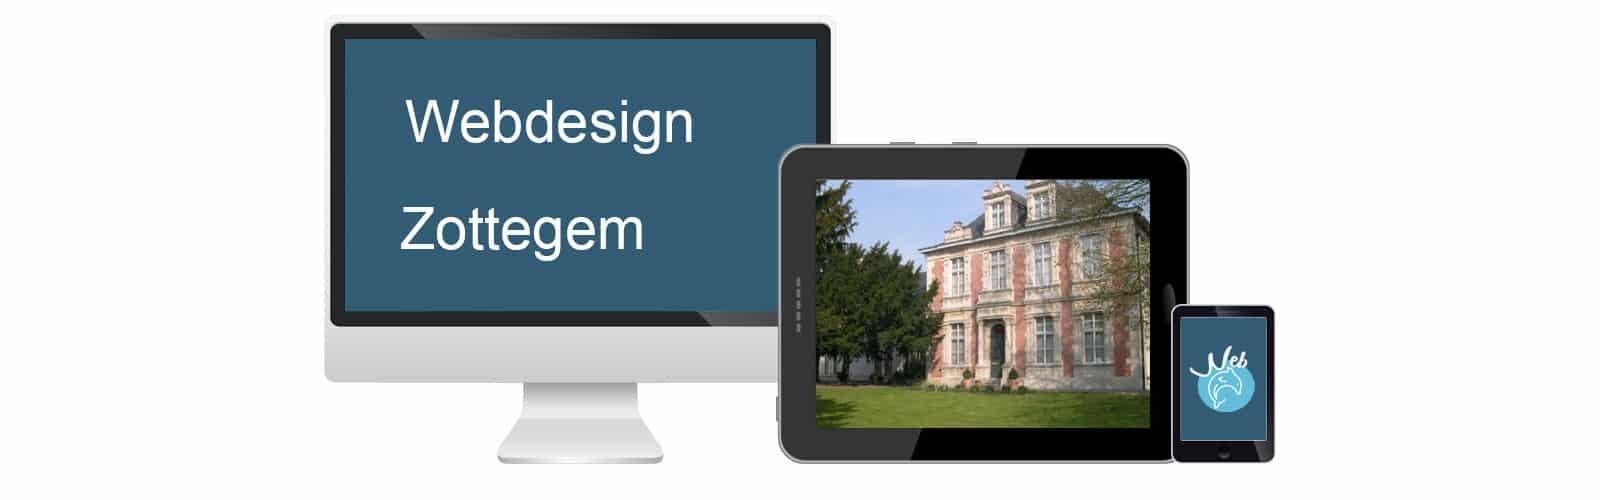 Webdesign Zottegem - webdolfijn